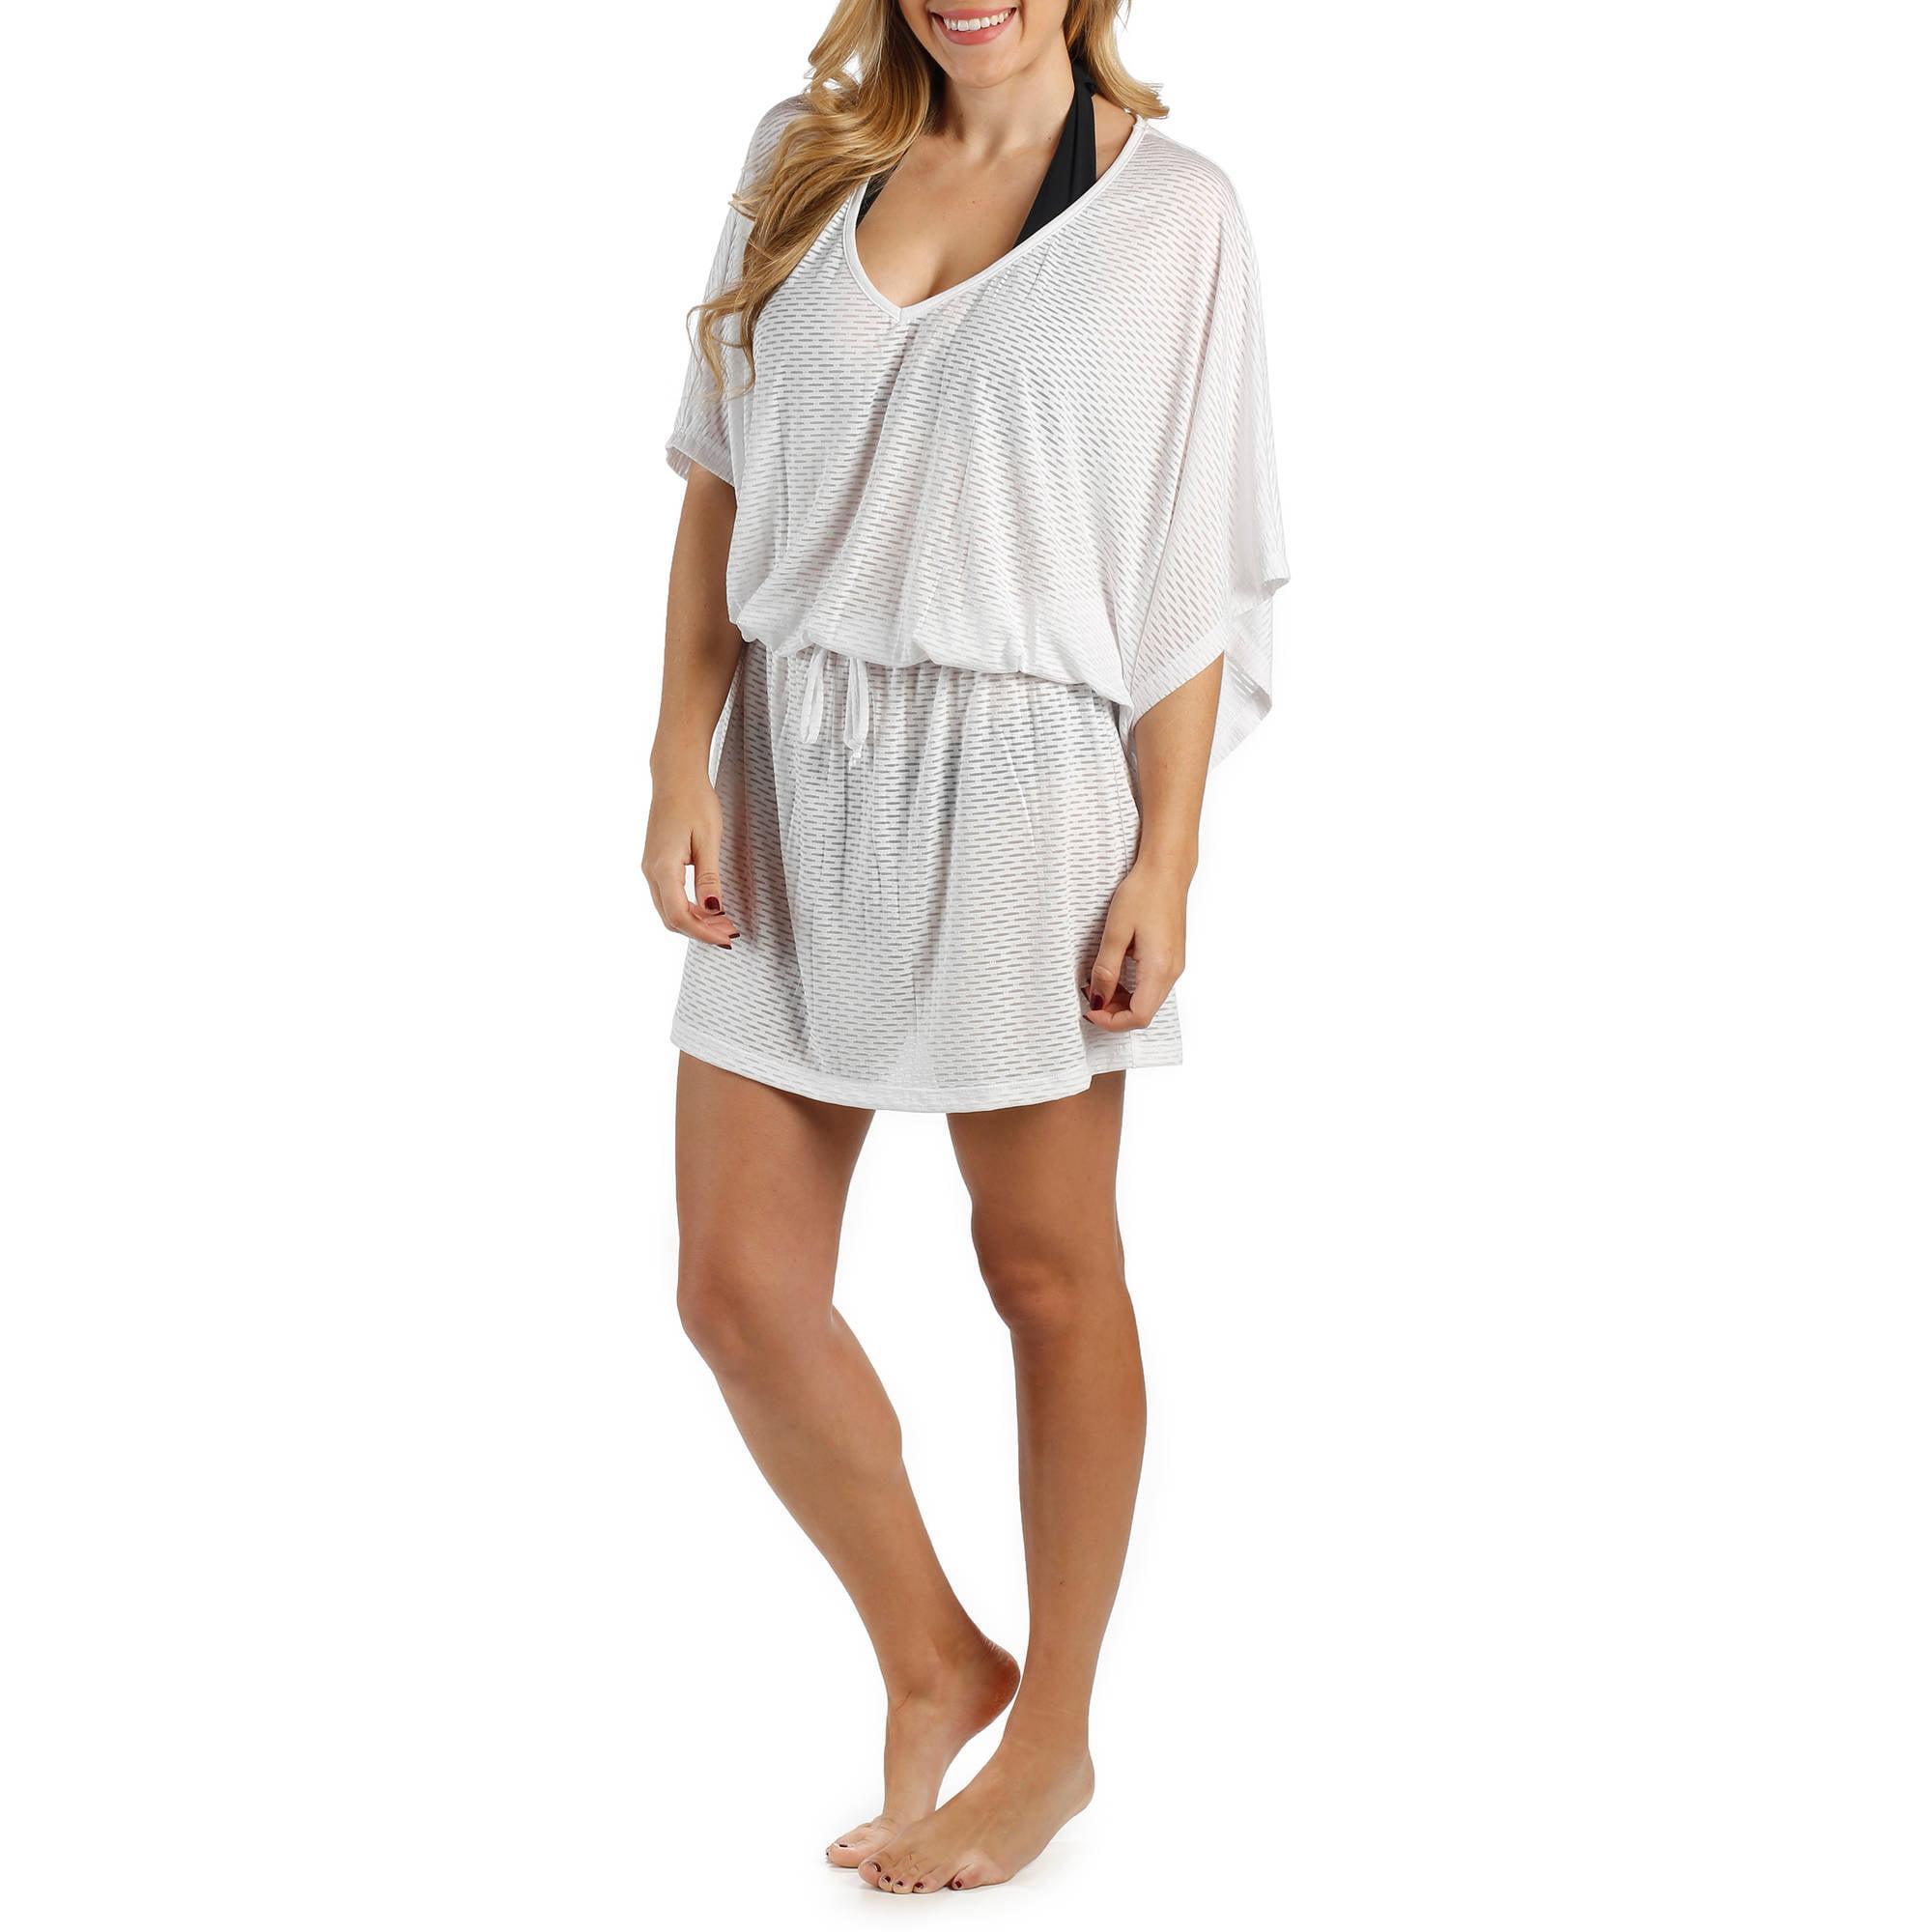 a74aae5500 Catalina - Women s Blouson Tunic Swim Cover-Up - Walmart.com